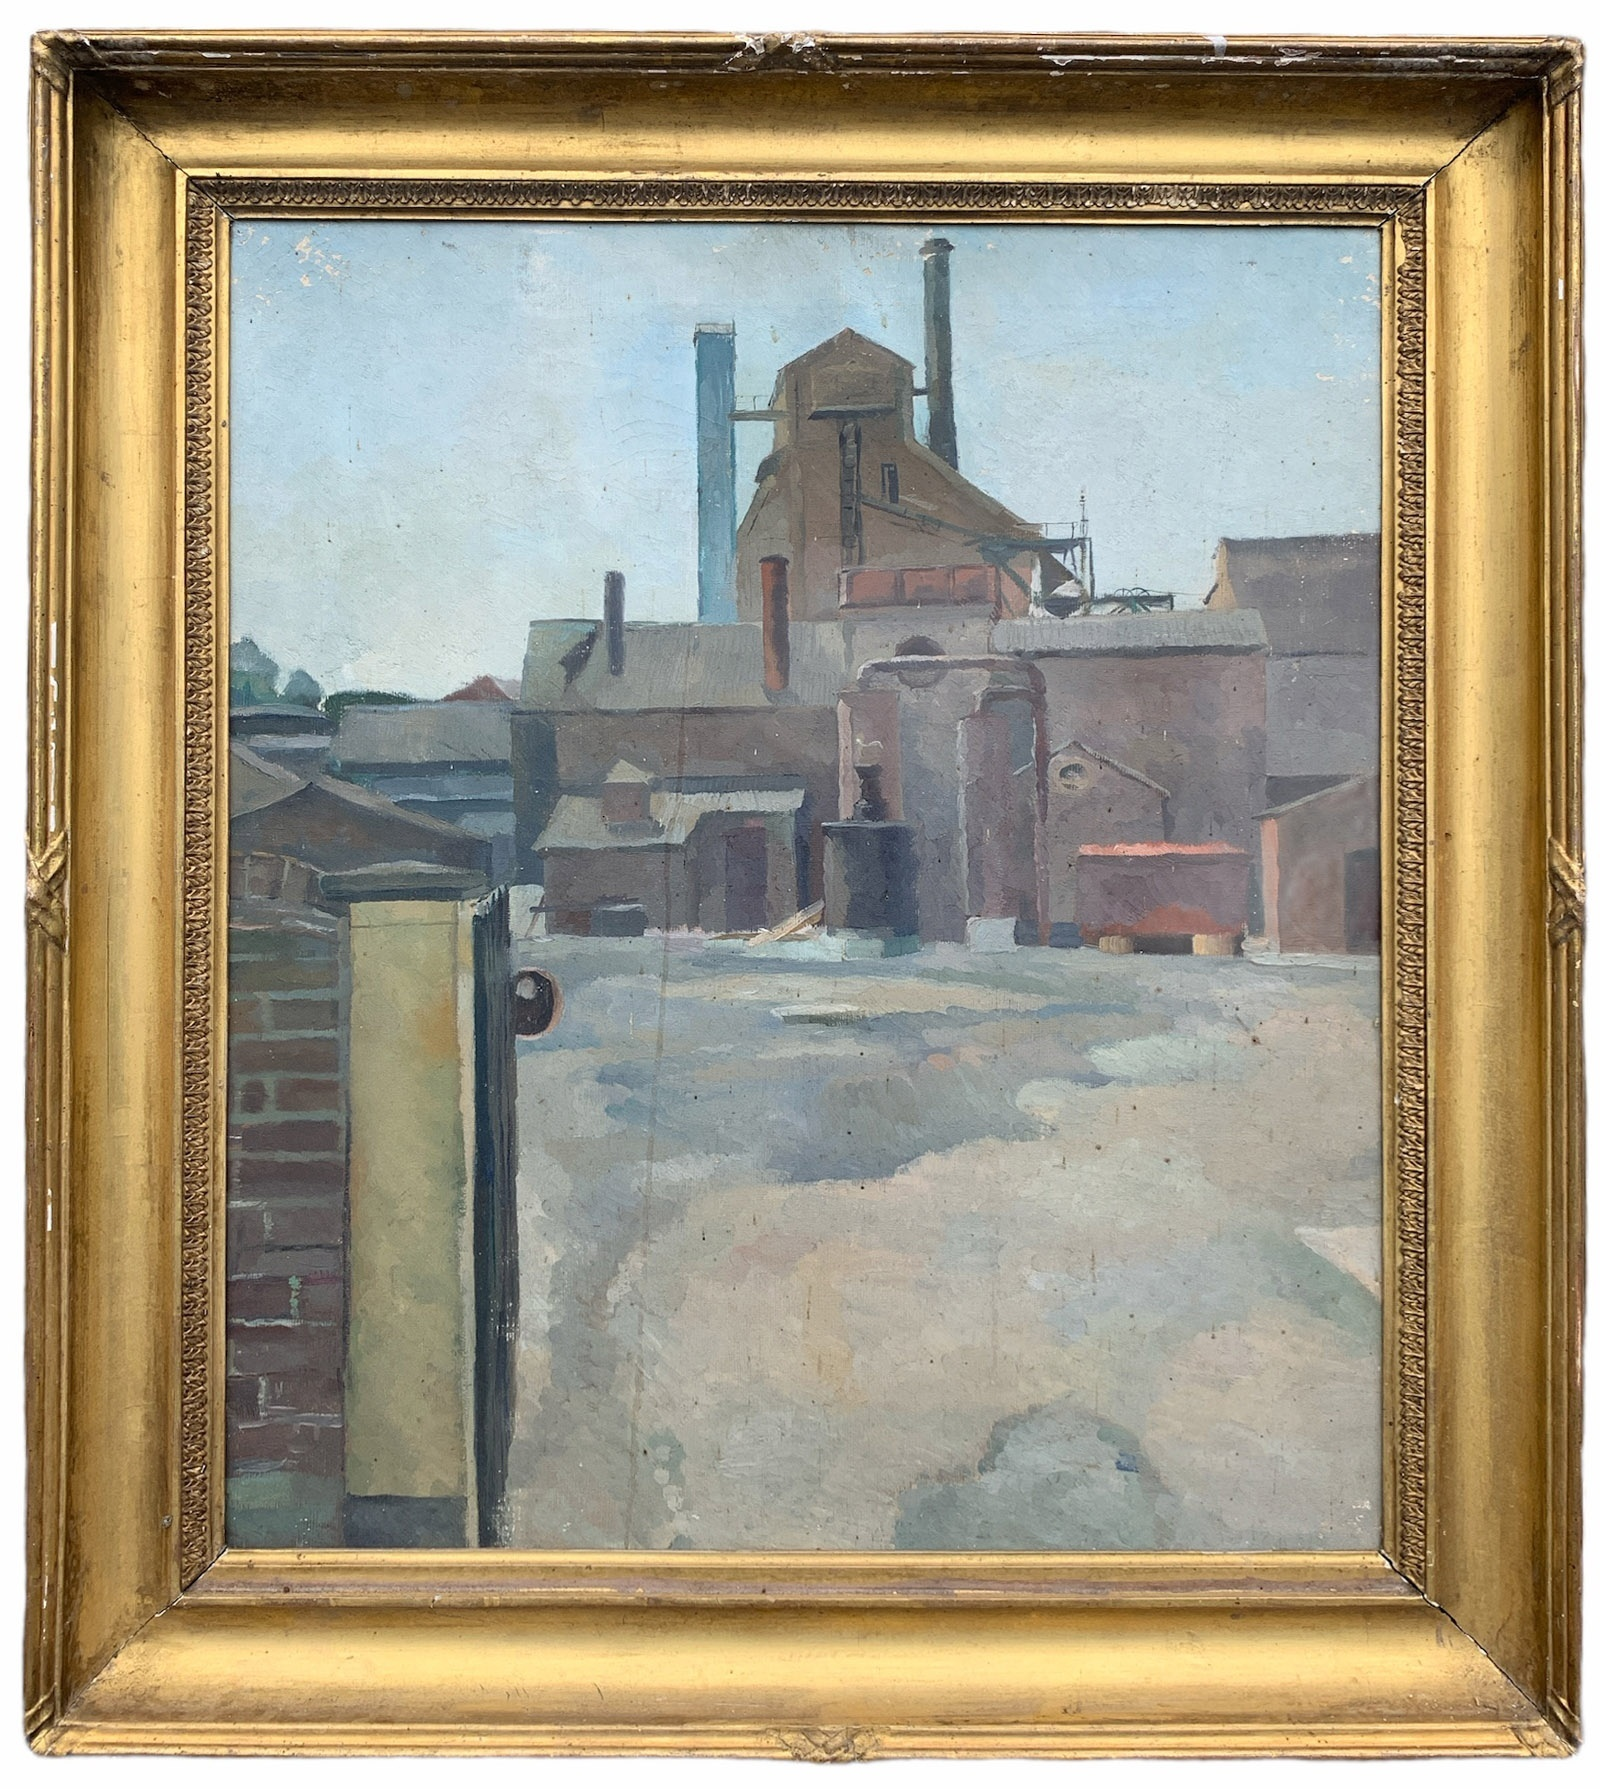 A 20TH CENTURY BRITISH SCHOOL OIL ON CANVAS Industrial landscape, gilt framed. (sight 62cm x 74.5cm,